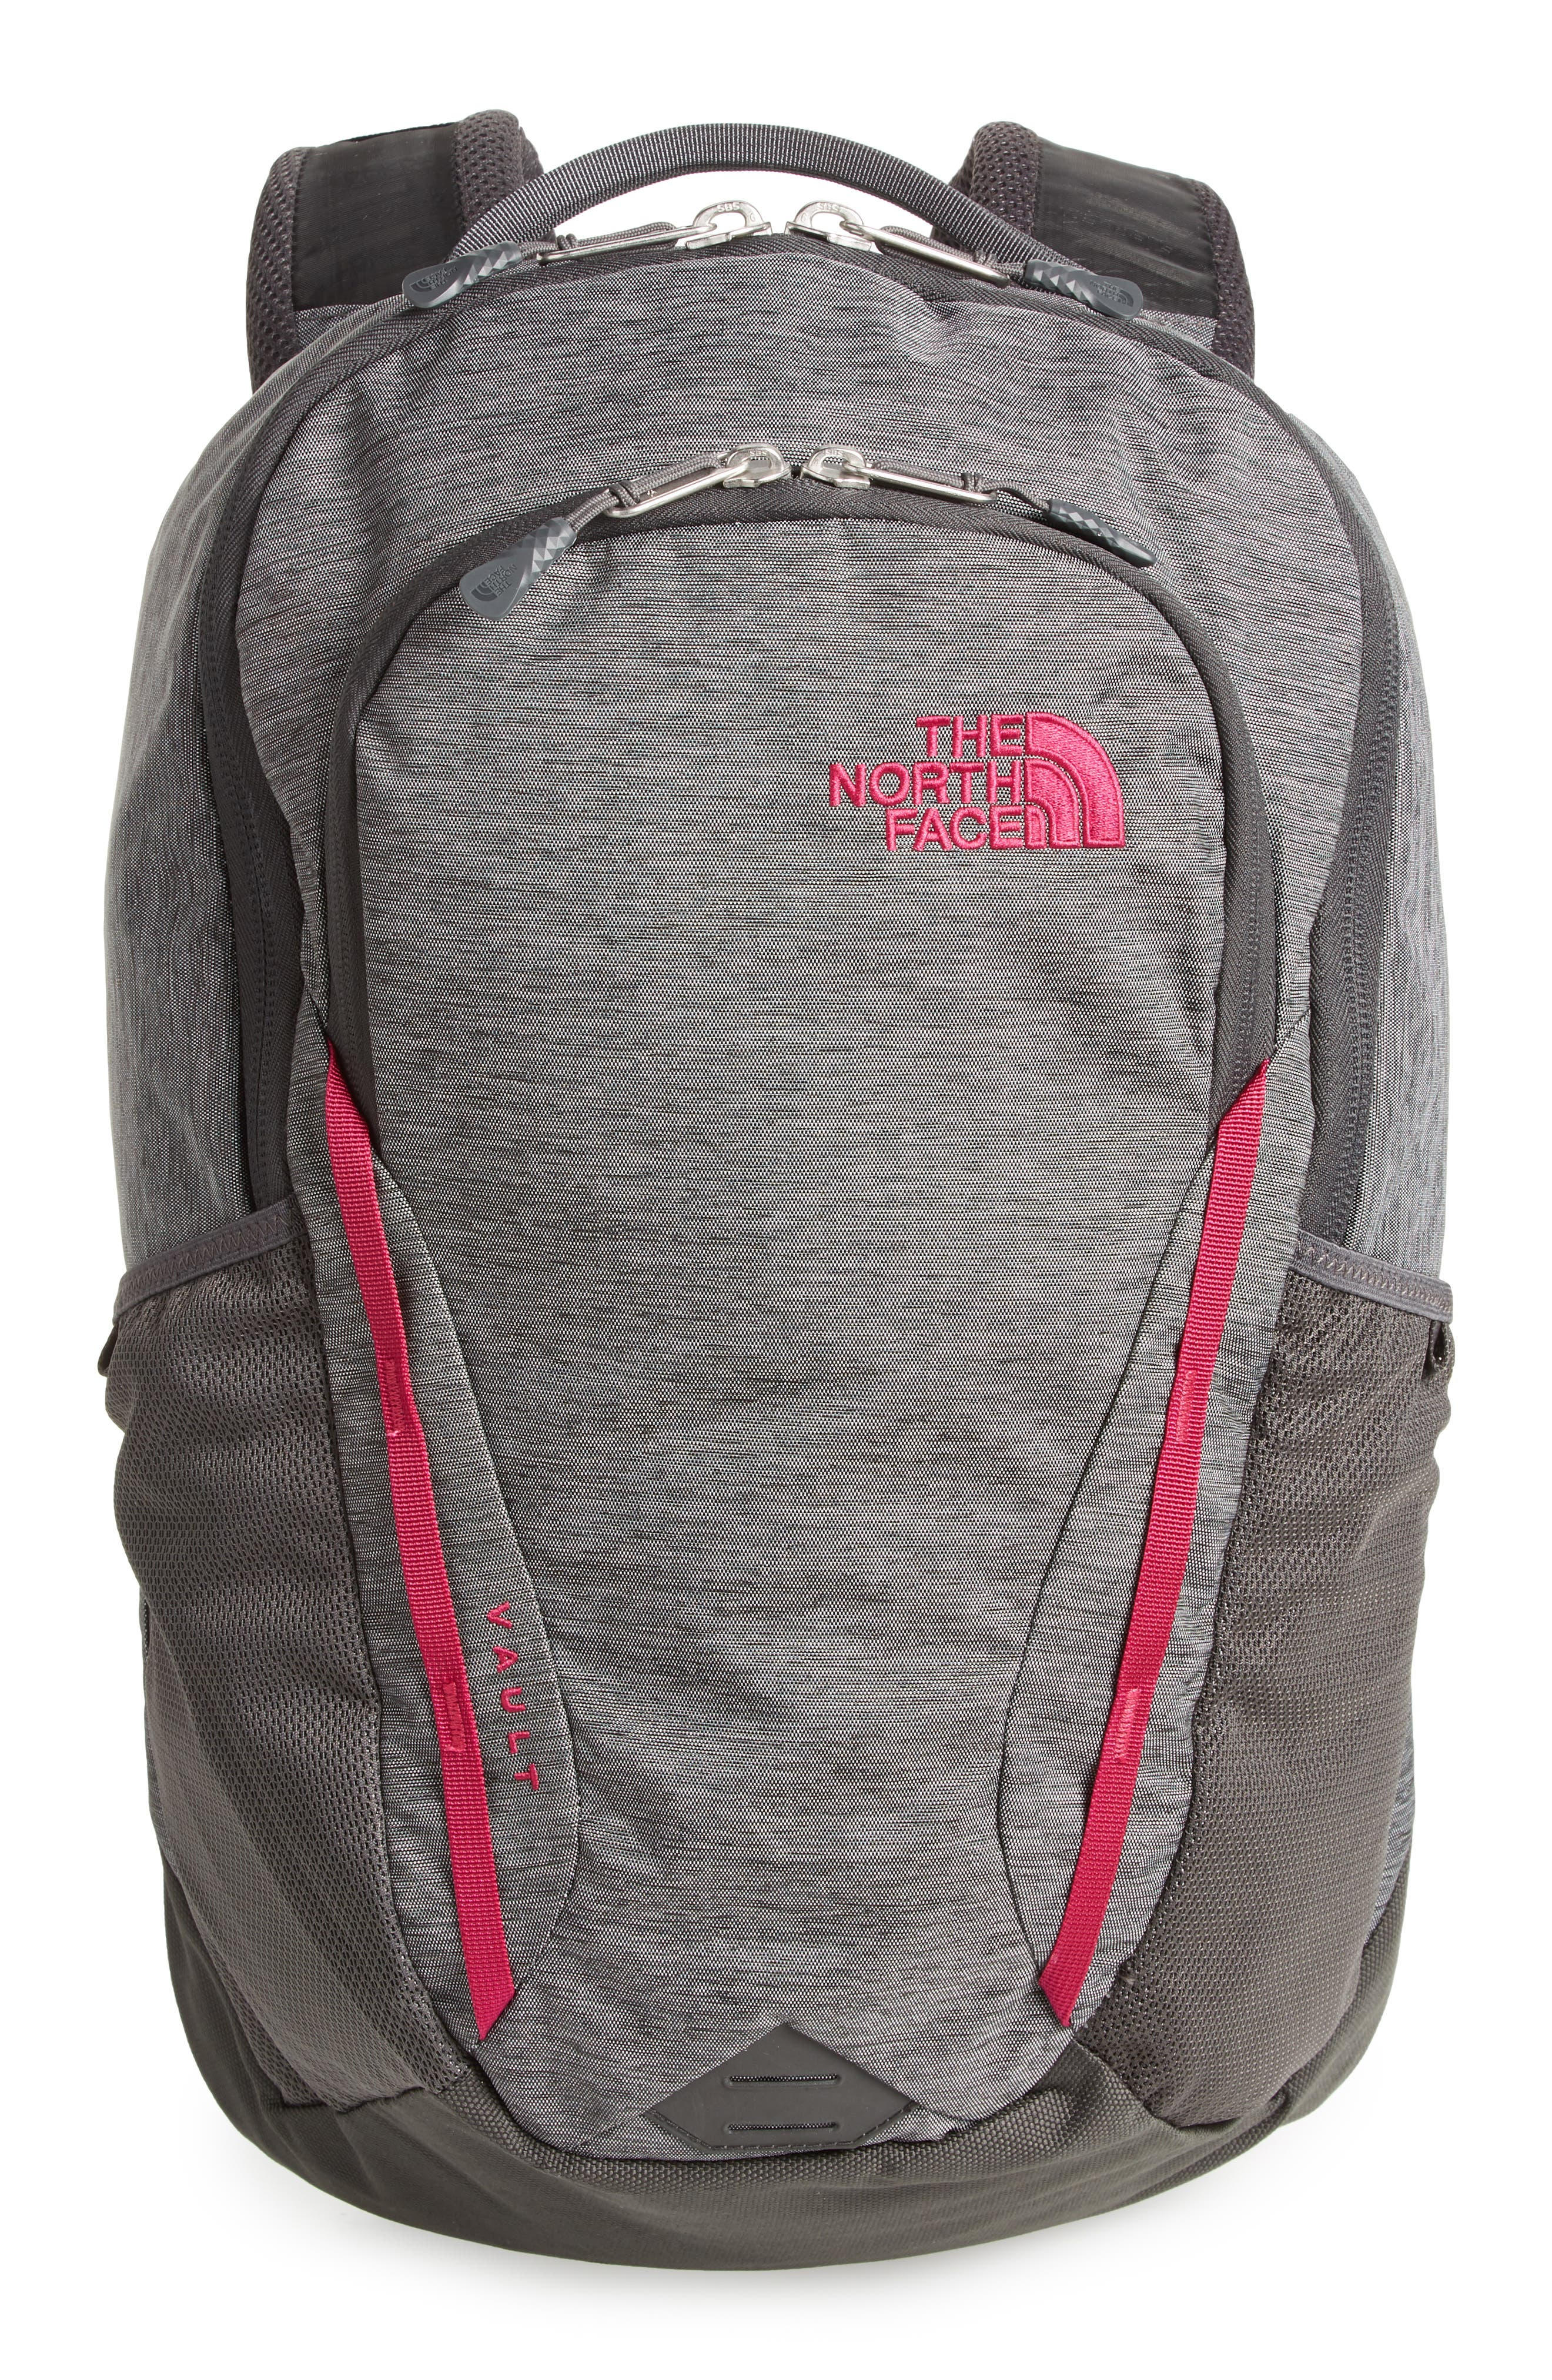 Vault Backpack,                         Main,                         color, ASPHALT GREY/ DRAMATIC PLUM